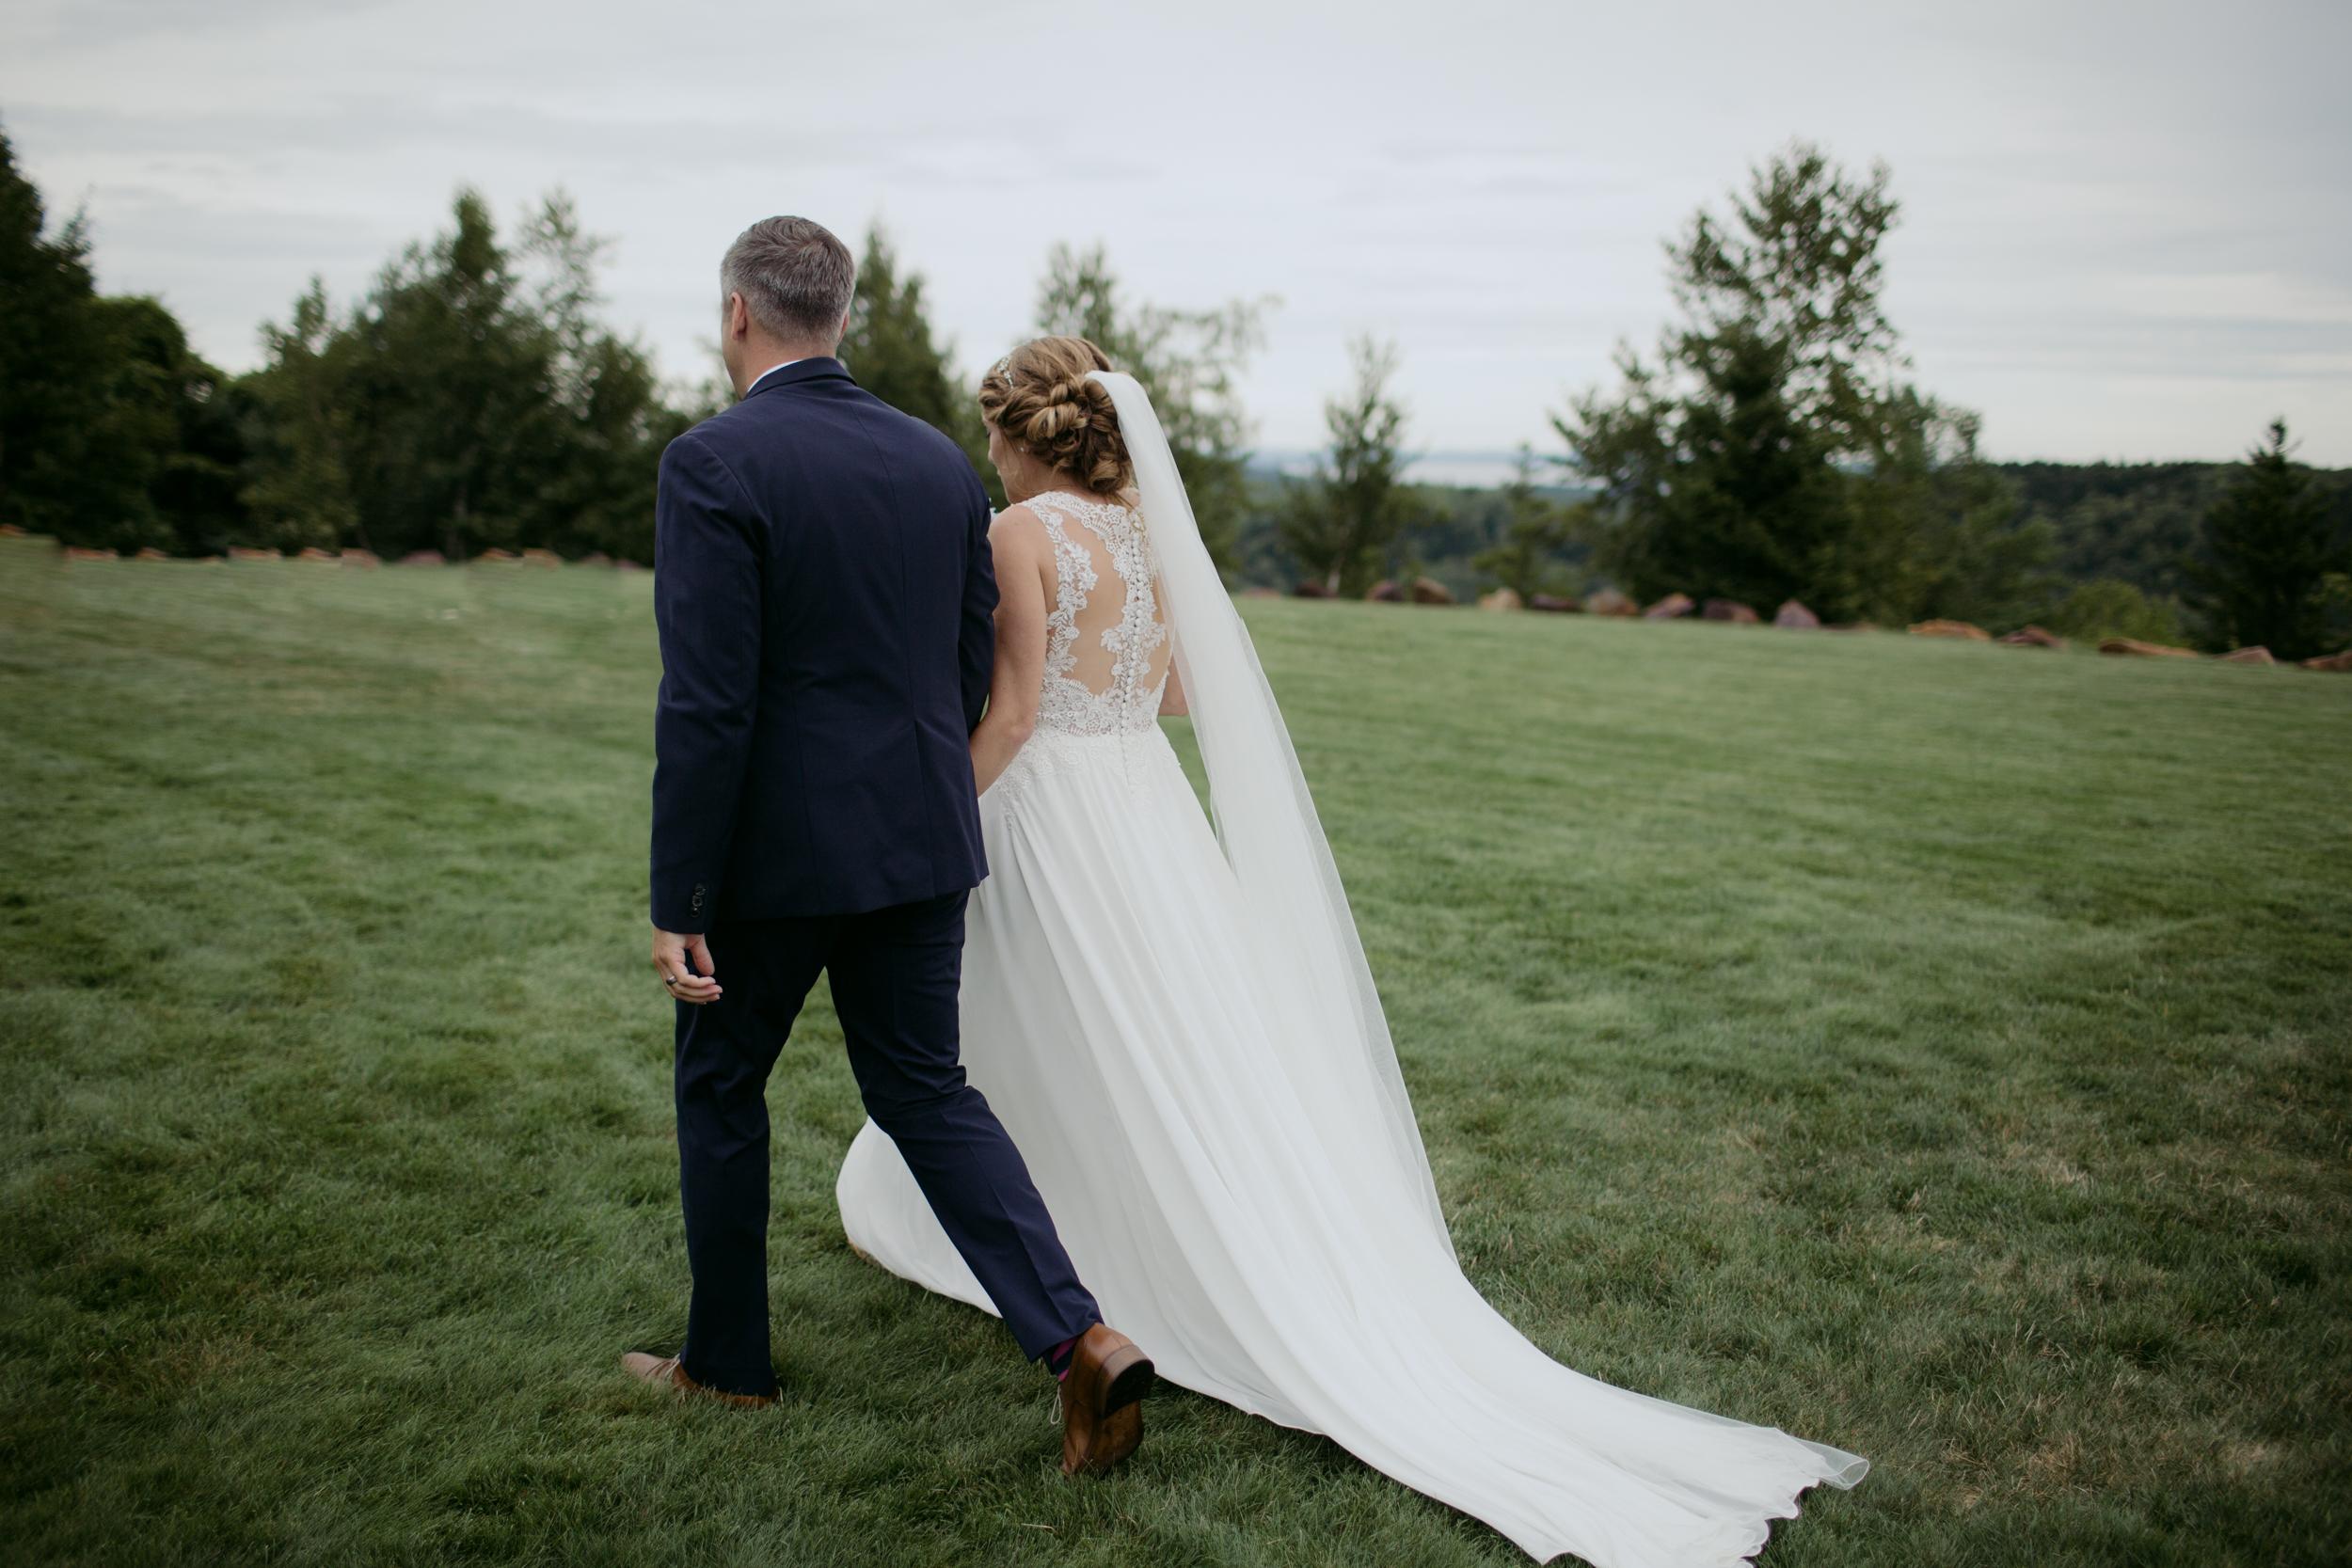 point_lookout_northport_Maine_Midcoast_wedding_leslie_justin-18.jpg